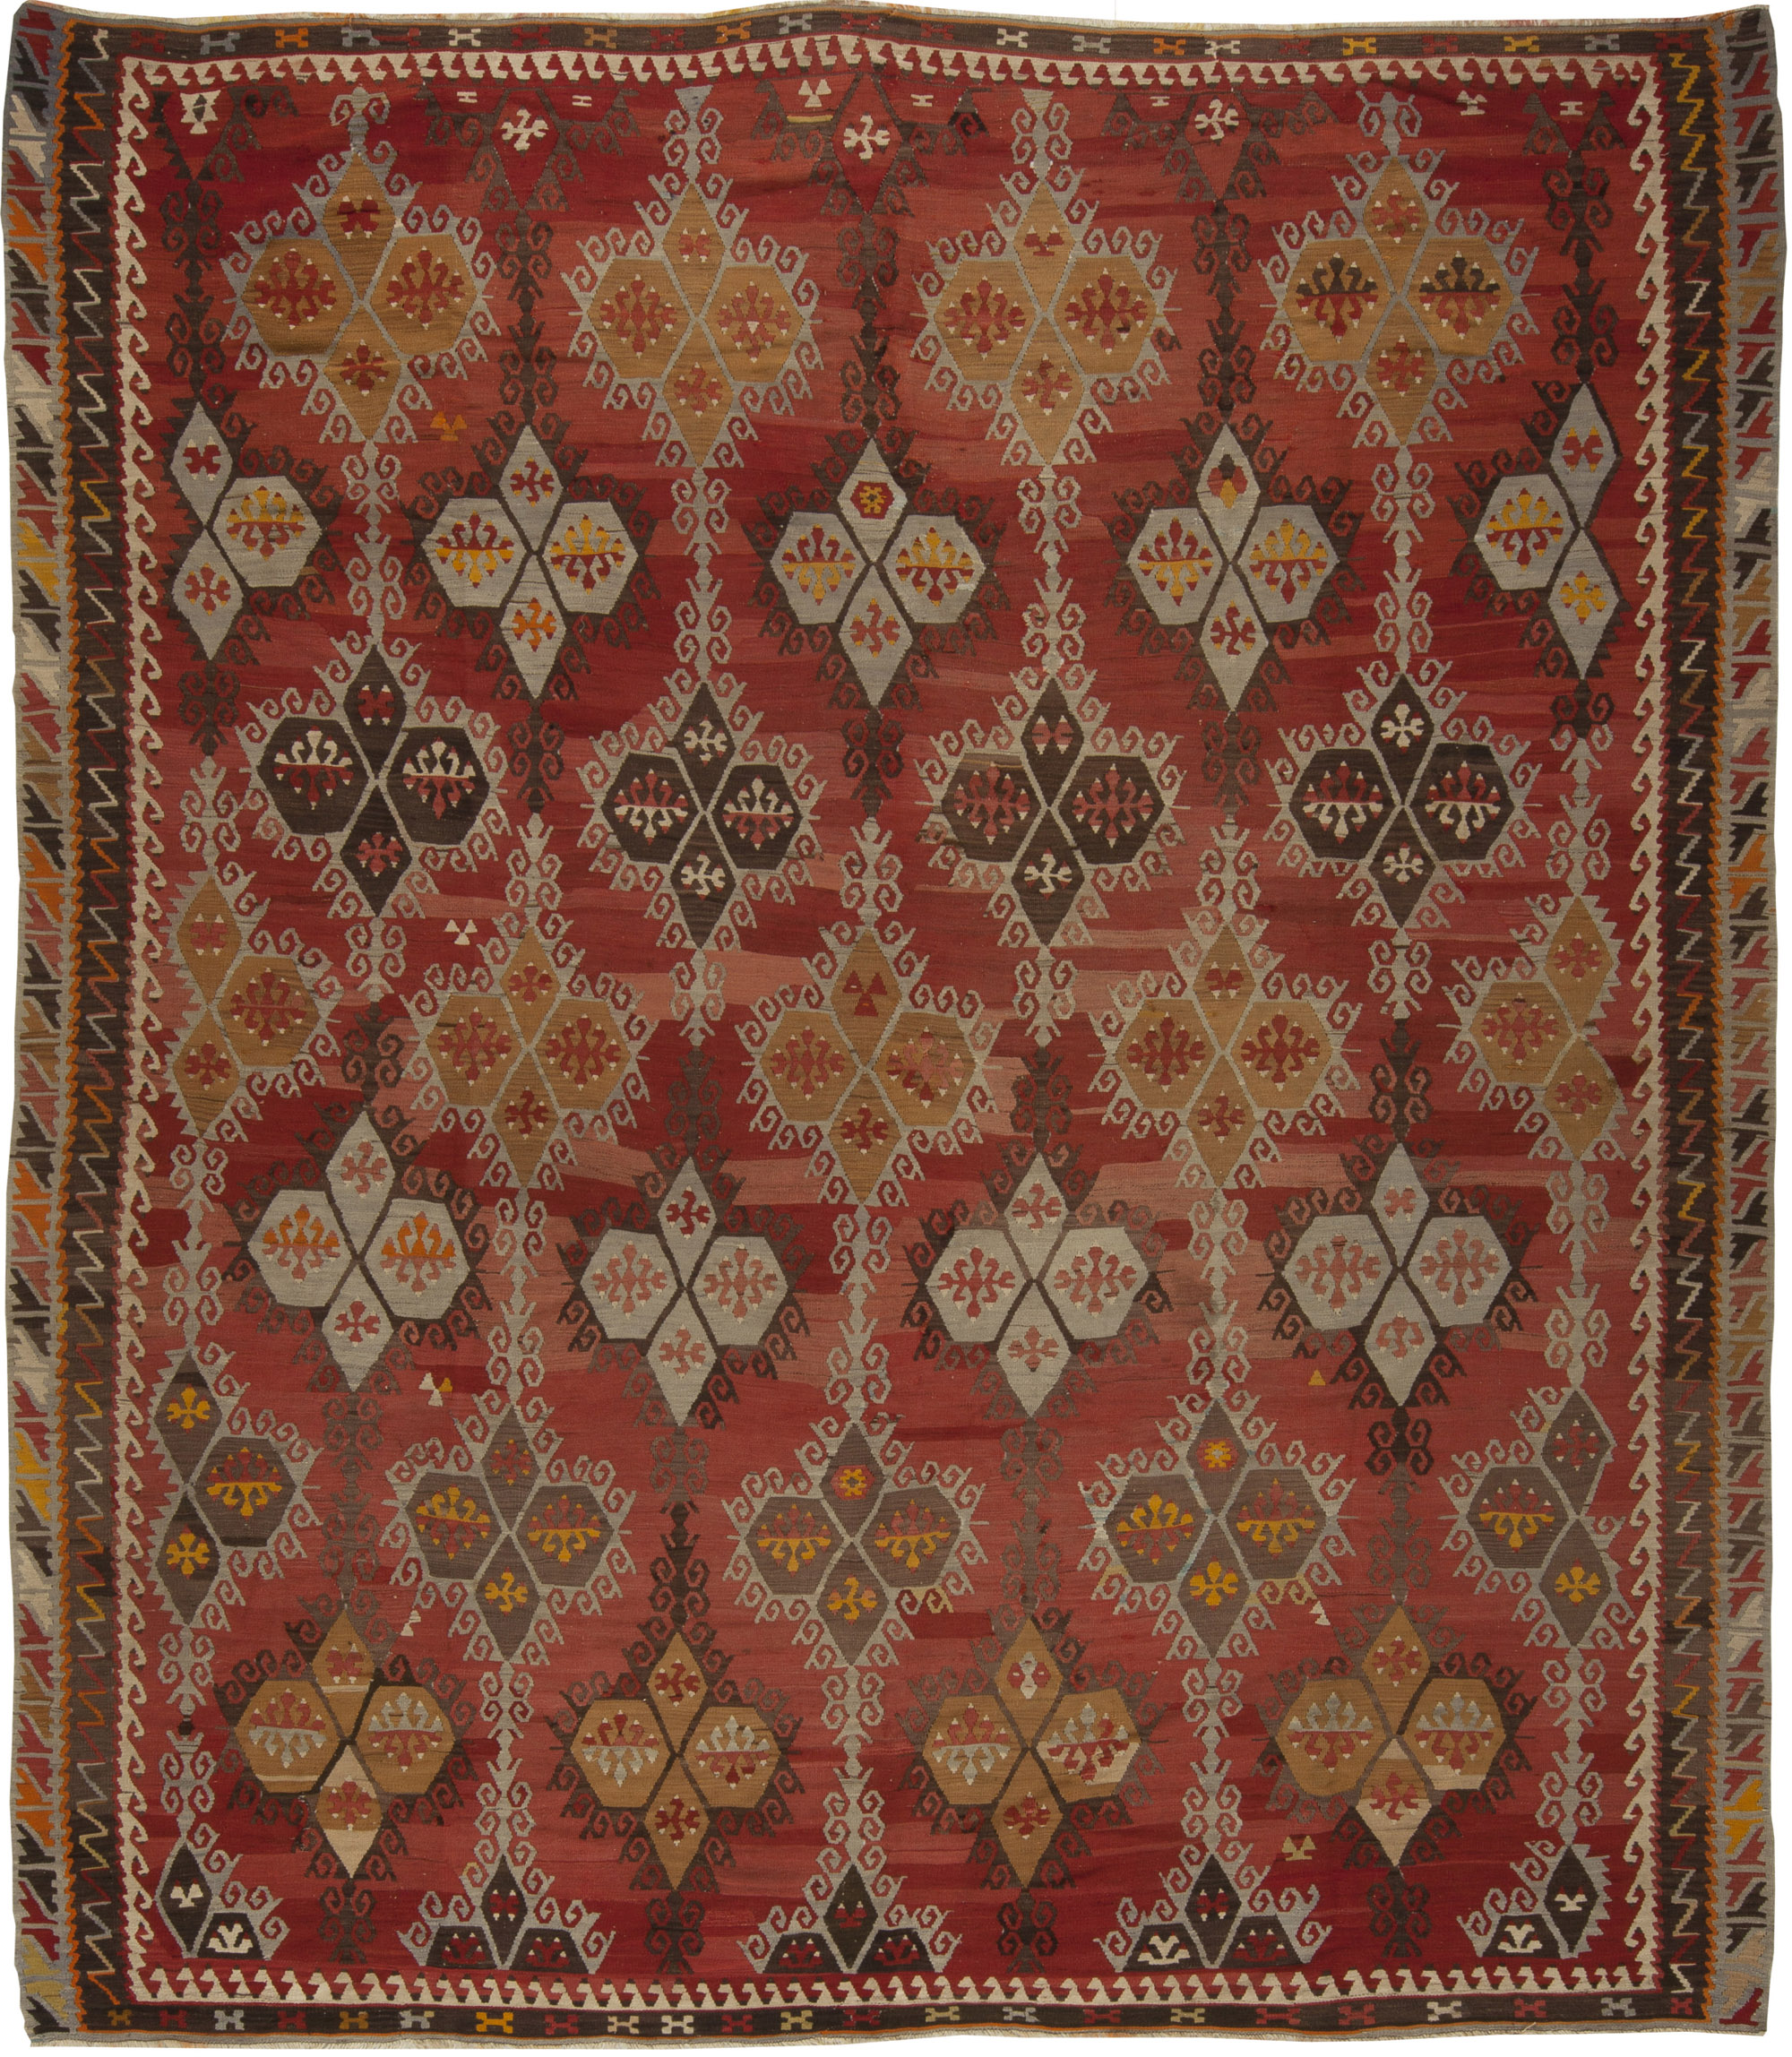 Antique Turkish Kilim Rug BB5428 By Doris Leslie Blau